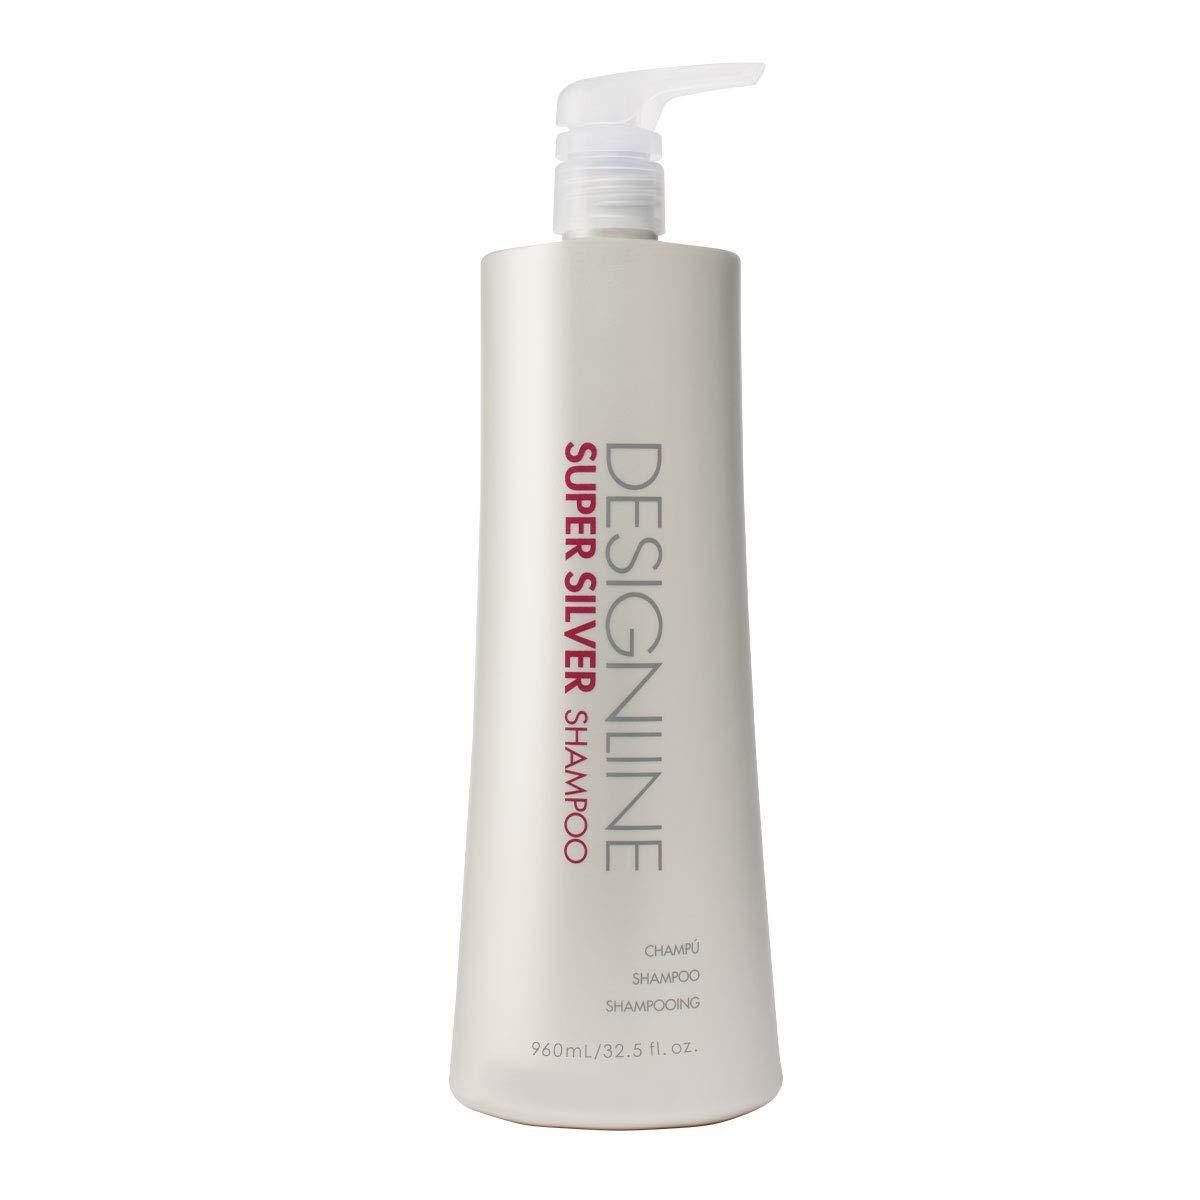 Super Silver Shampoo, 32.5 oz - Regis DESIGNLINE - Restores Moisture to Boost Color Brilliance for Blonde, Grey, White Hair and Strengthens, Detangles, Improves Elasticity to Prevent Color Fade